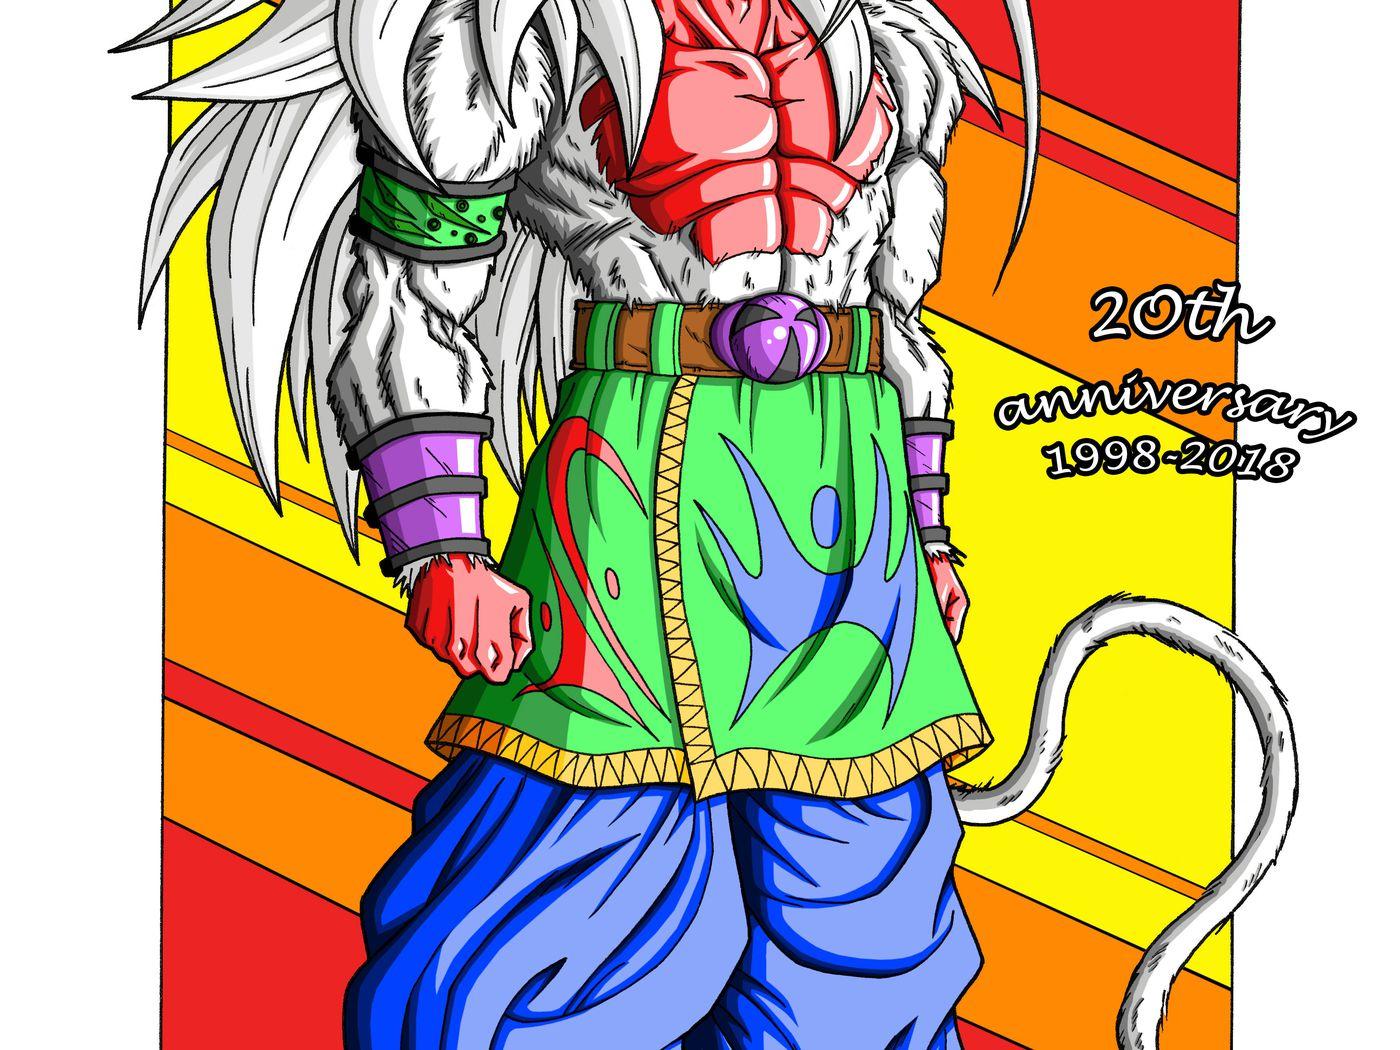 How A Super Saiyan 5 Fan Art Hoax Transformed The Dragon Ball Franchise Polygon